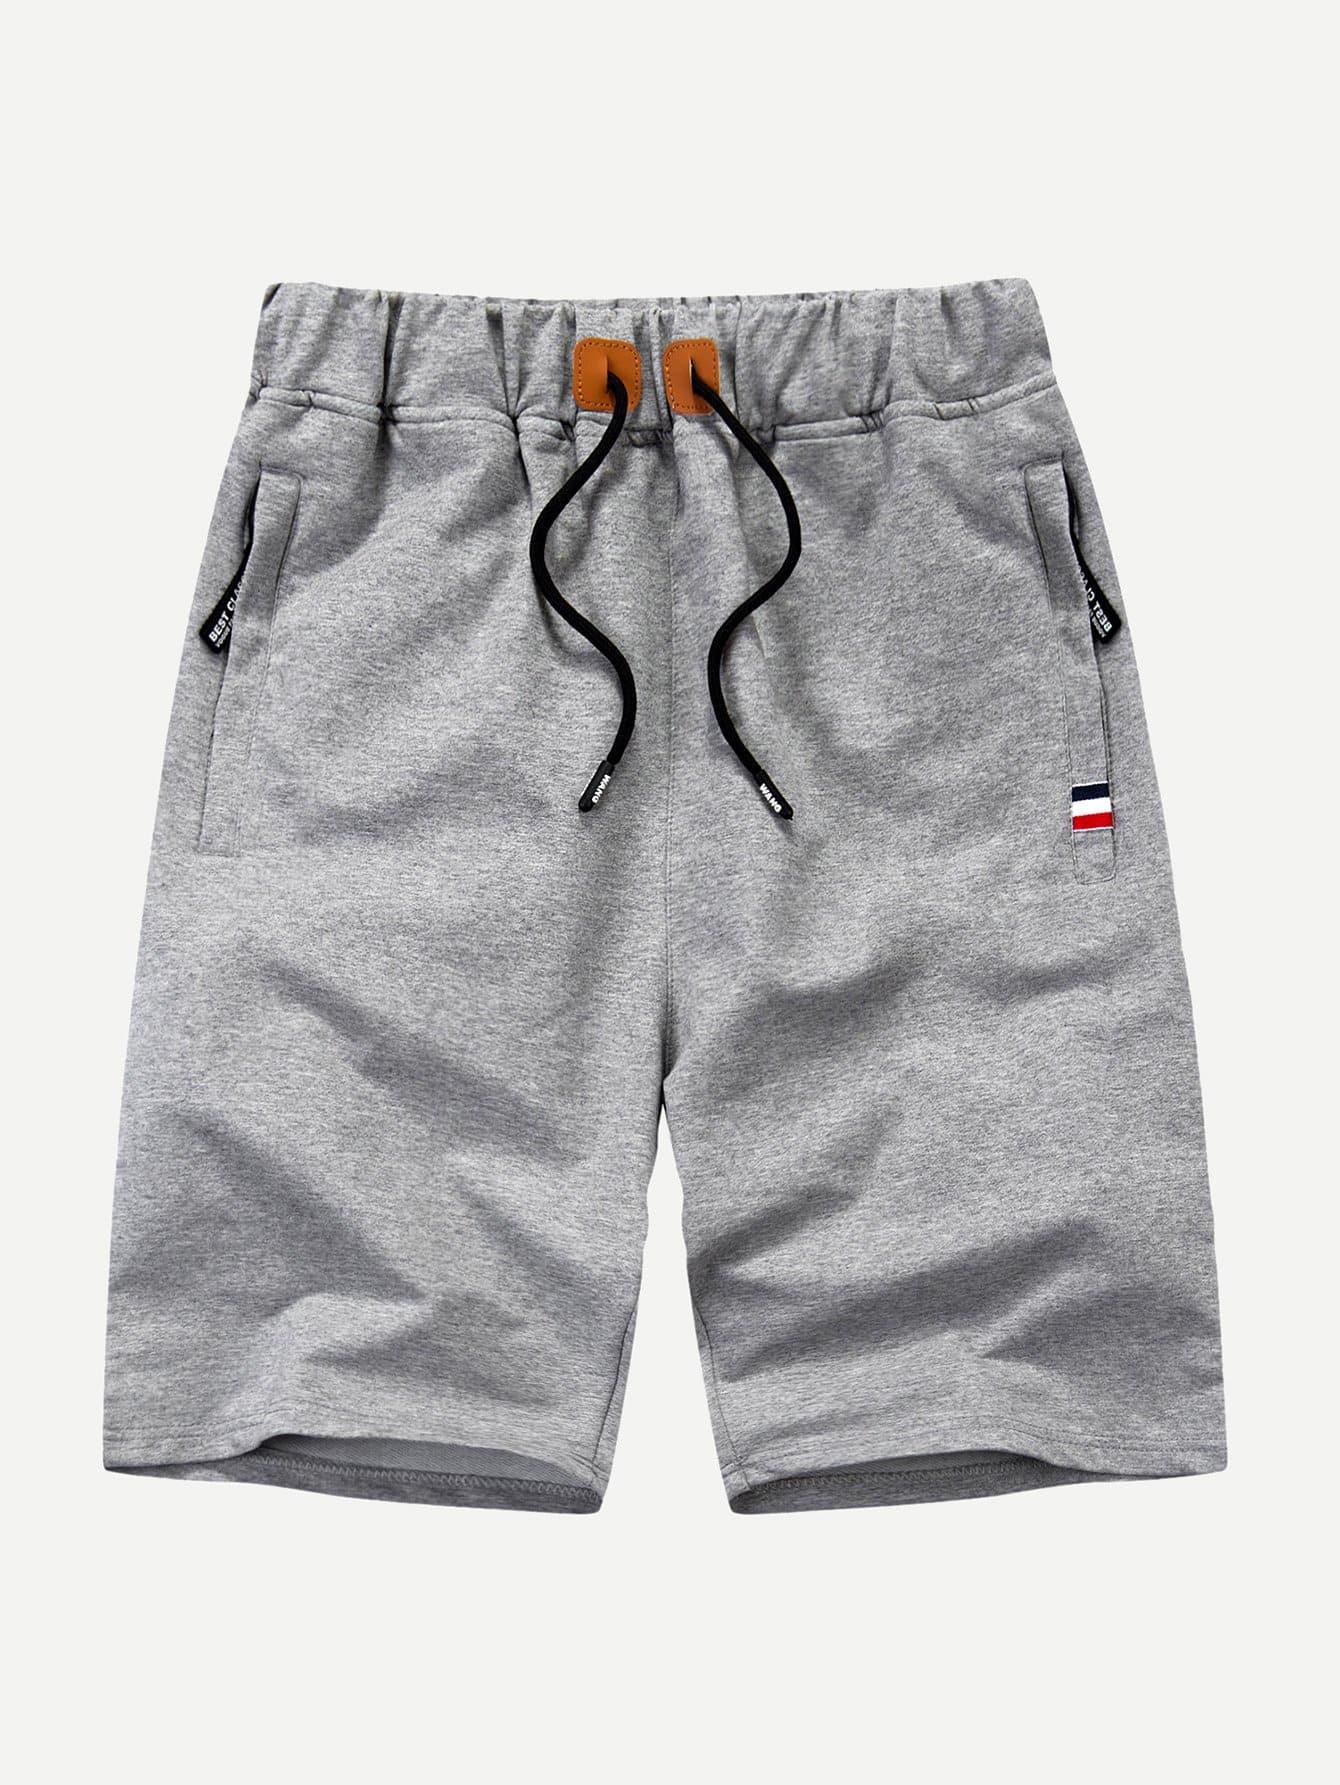 Men Cut And Sew Panel Drawstring Shorts men cut and sew panel beach shorts